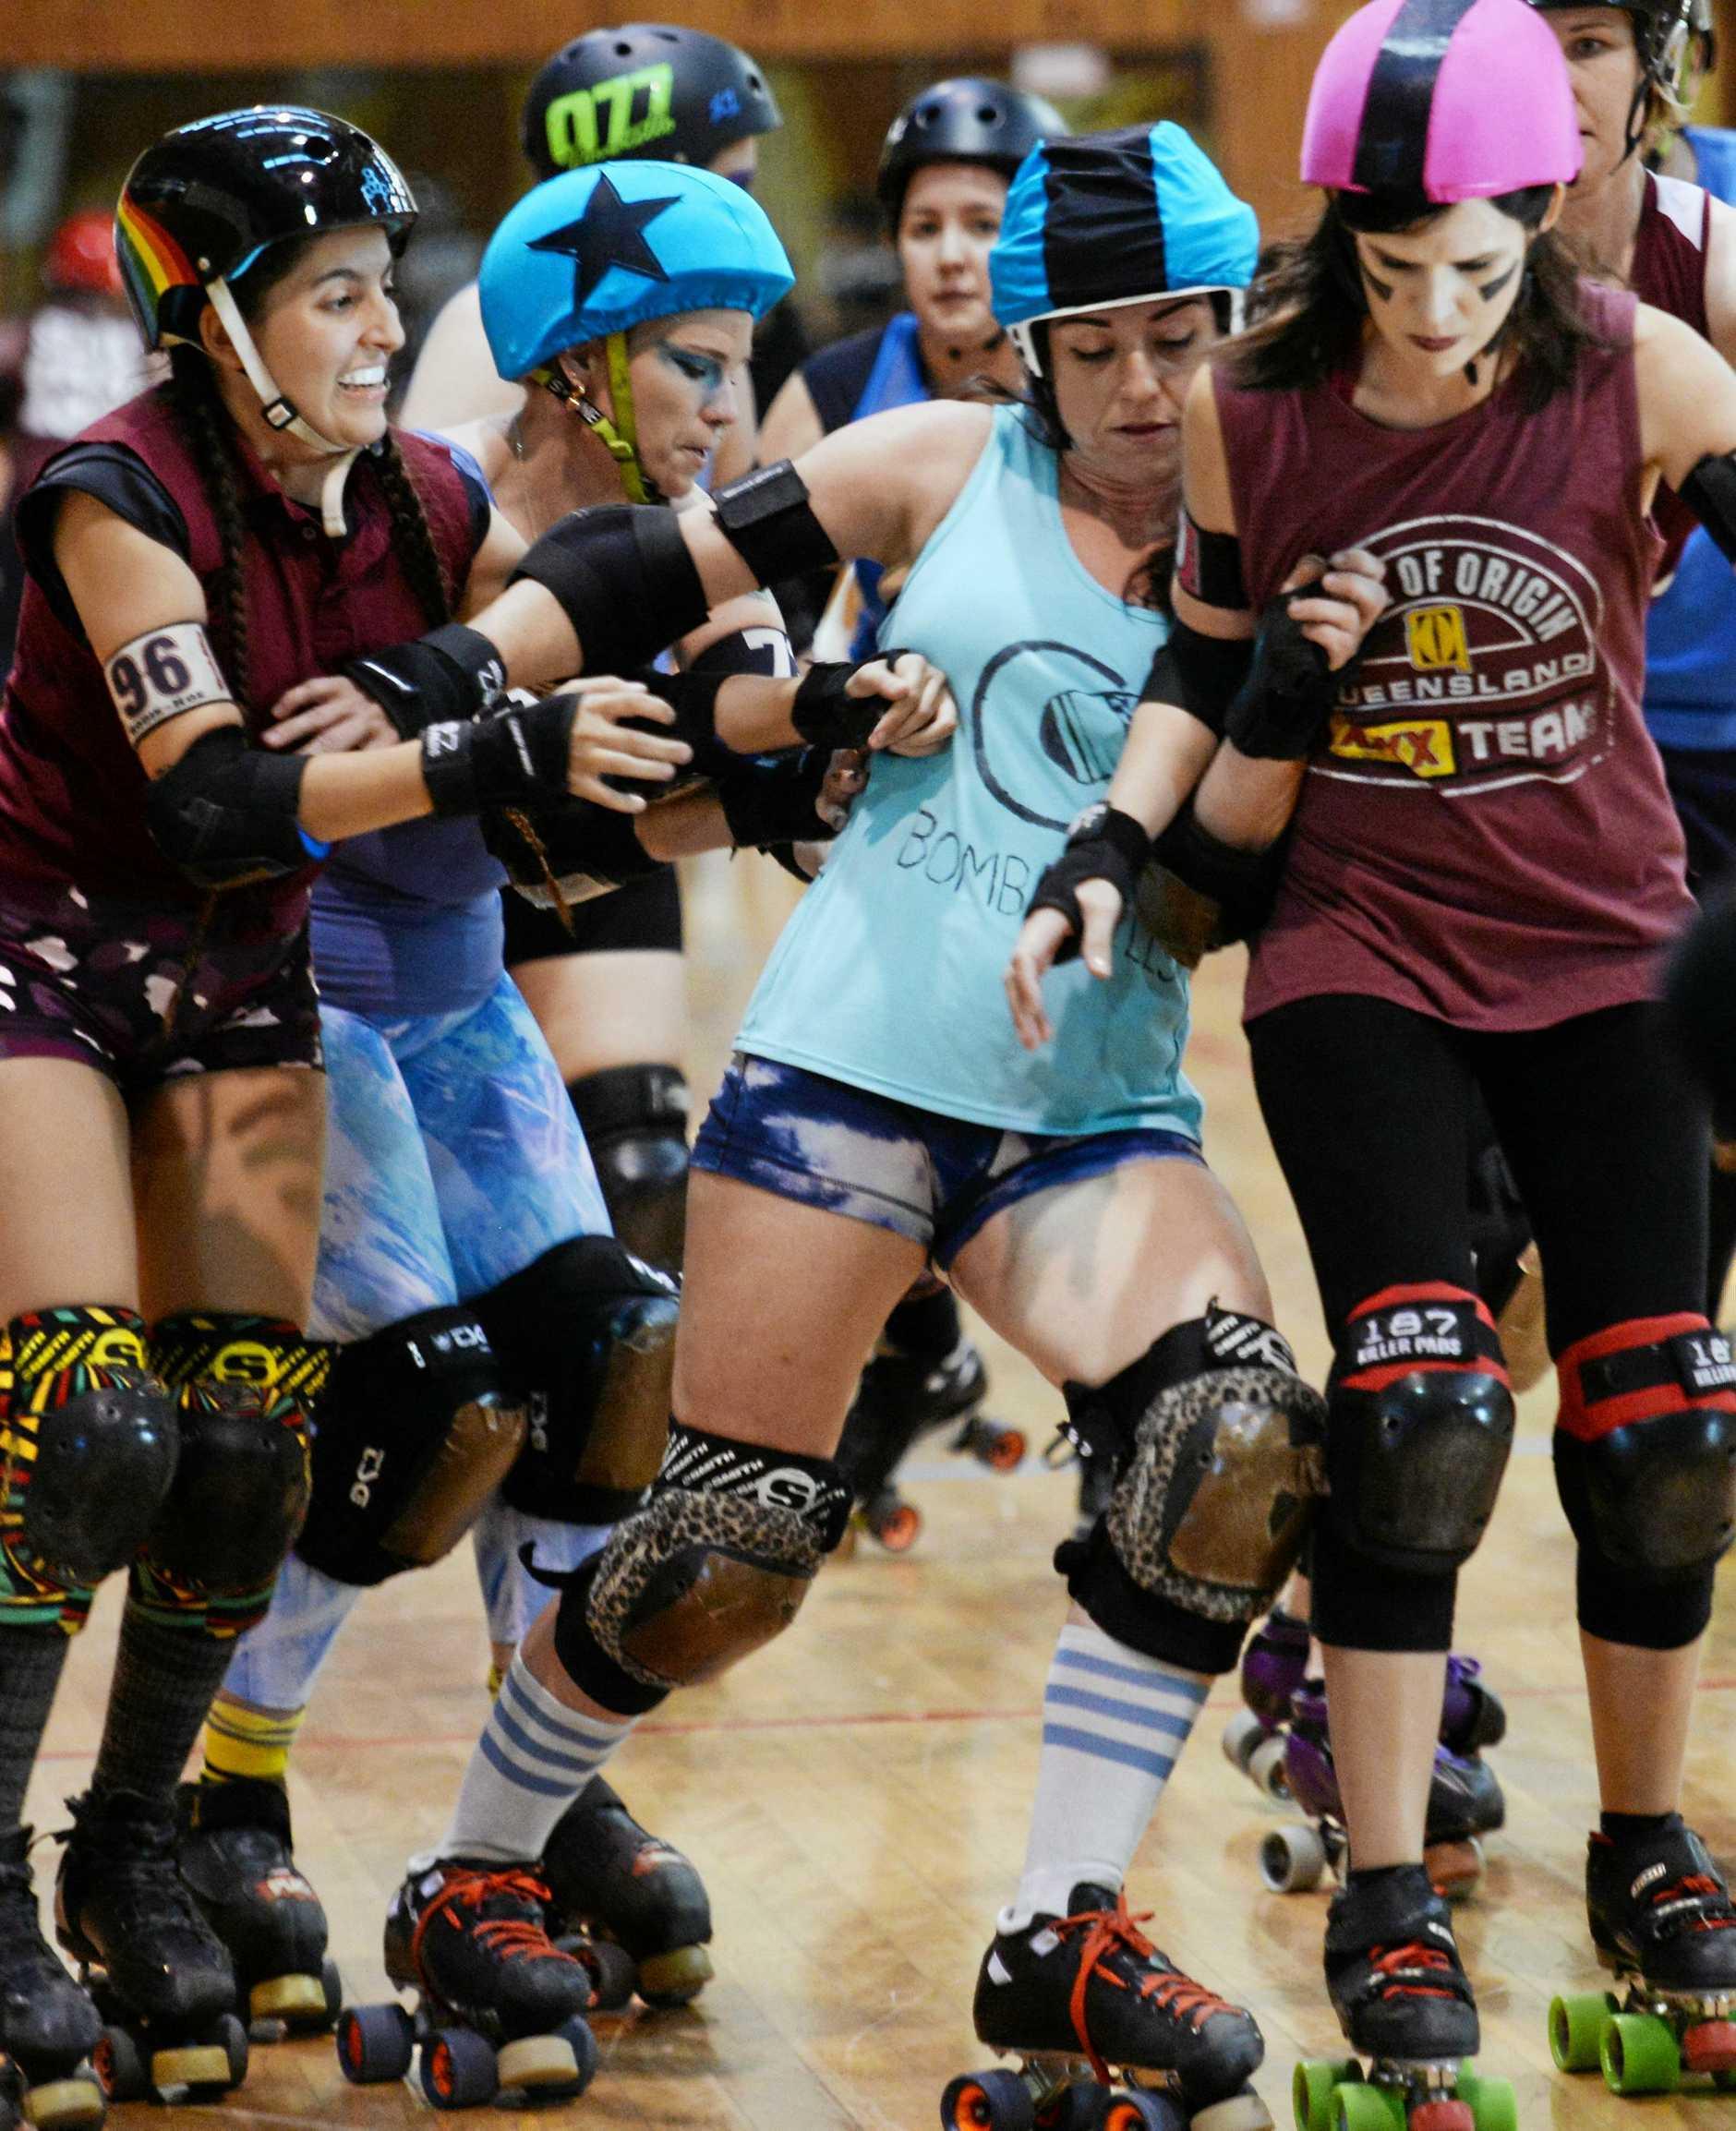 Roller derby: Skate of Origin 2019